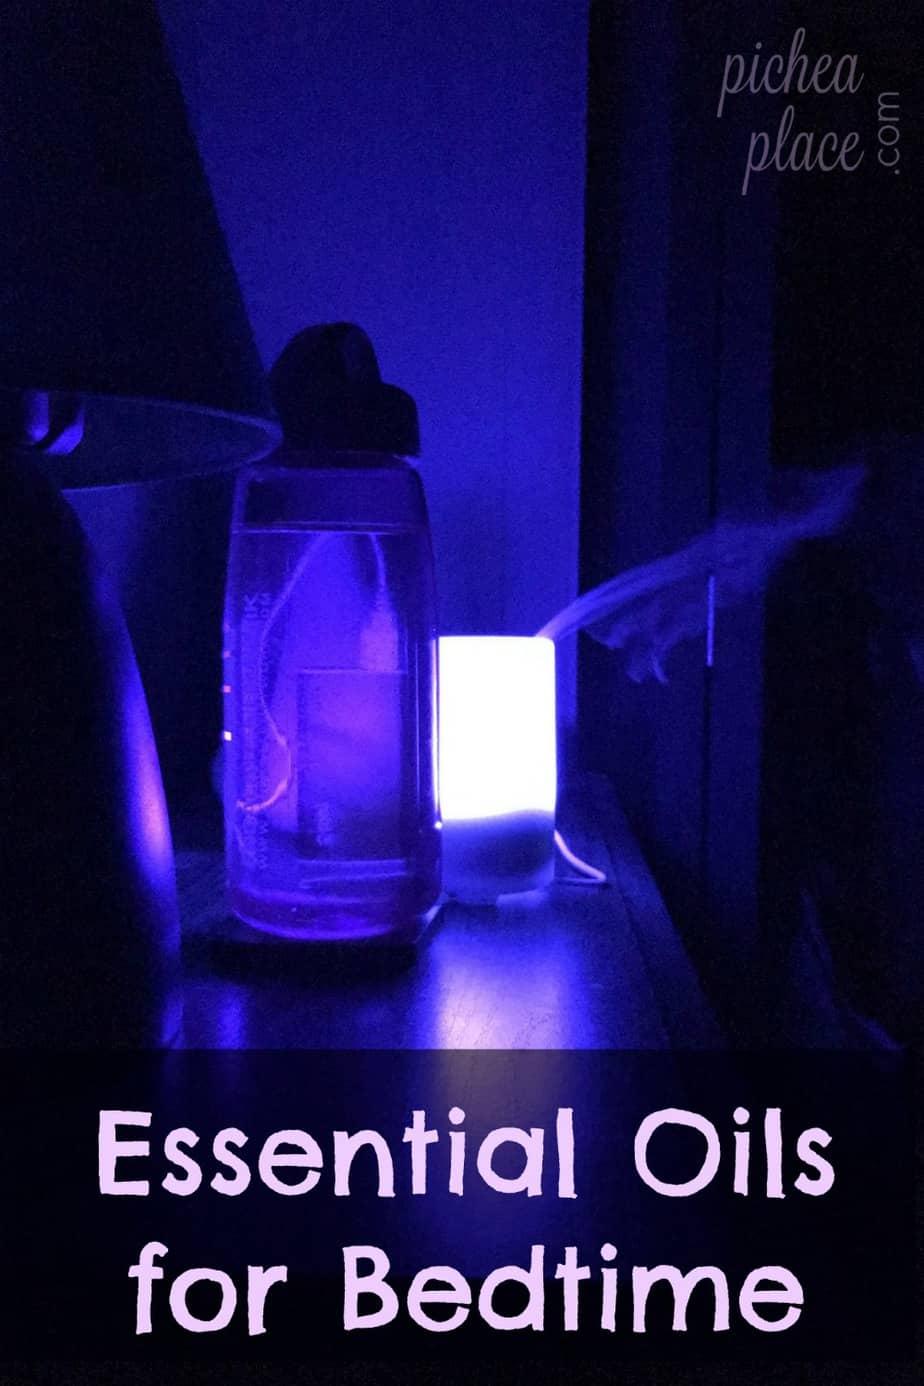 essential oils for bedtime